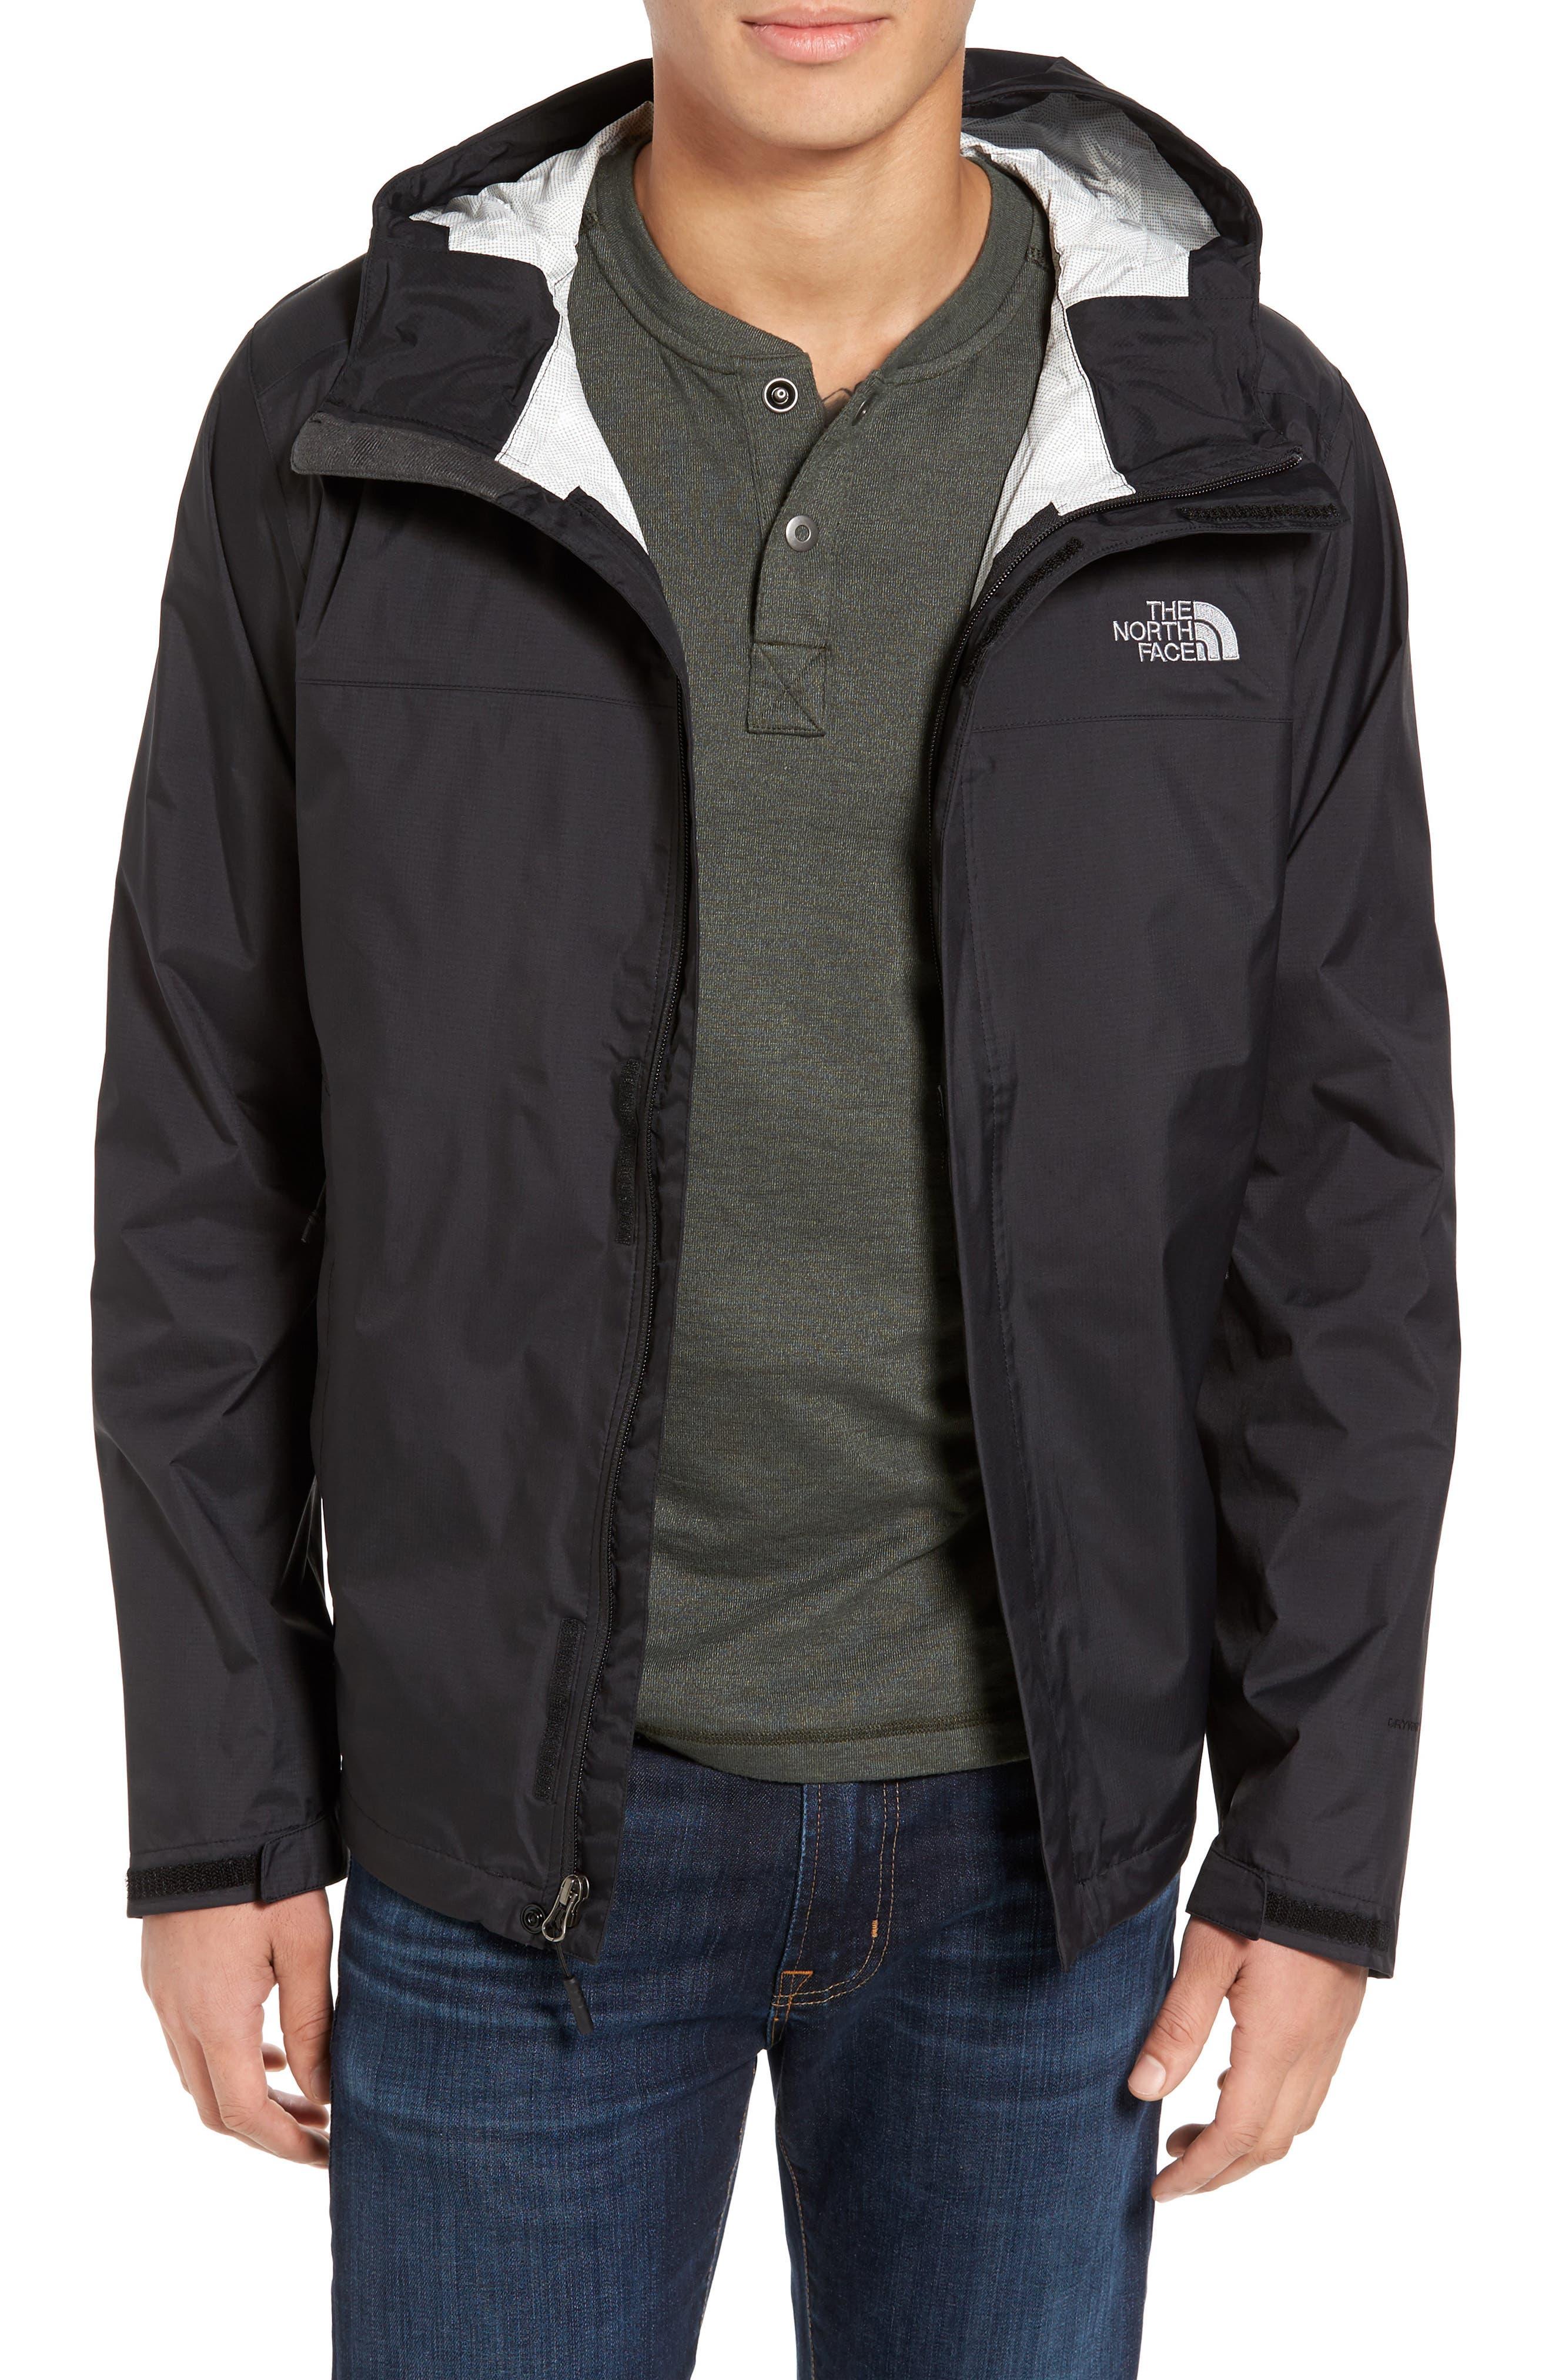 Alternate Image 1 Selected - The North Face Venture 2 Waterproof Jacket